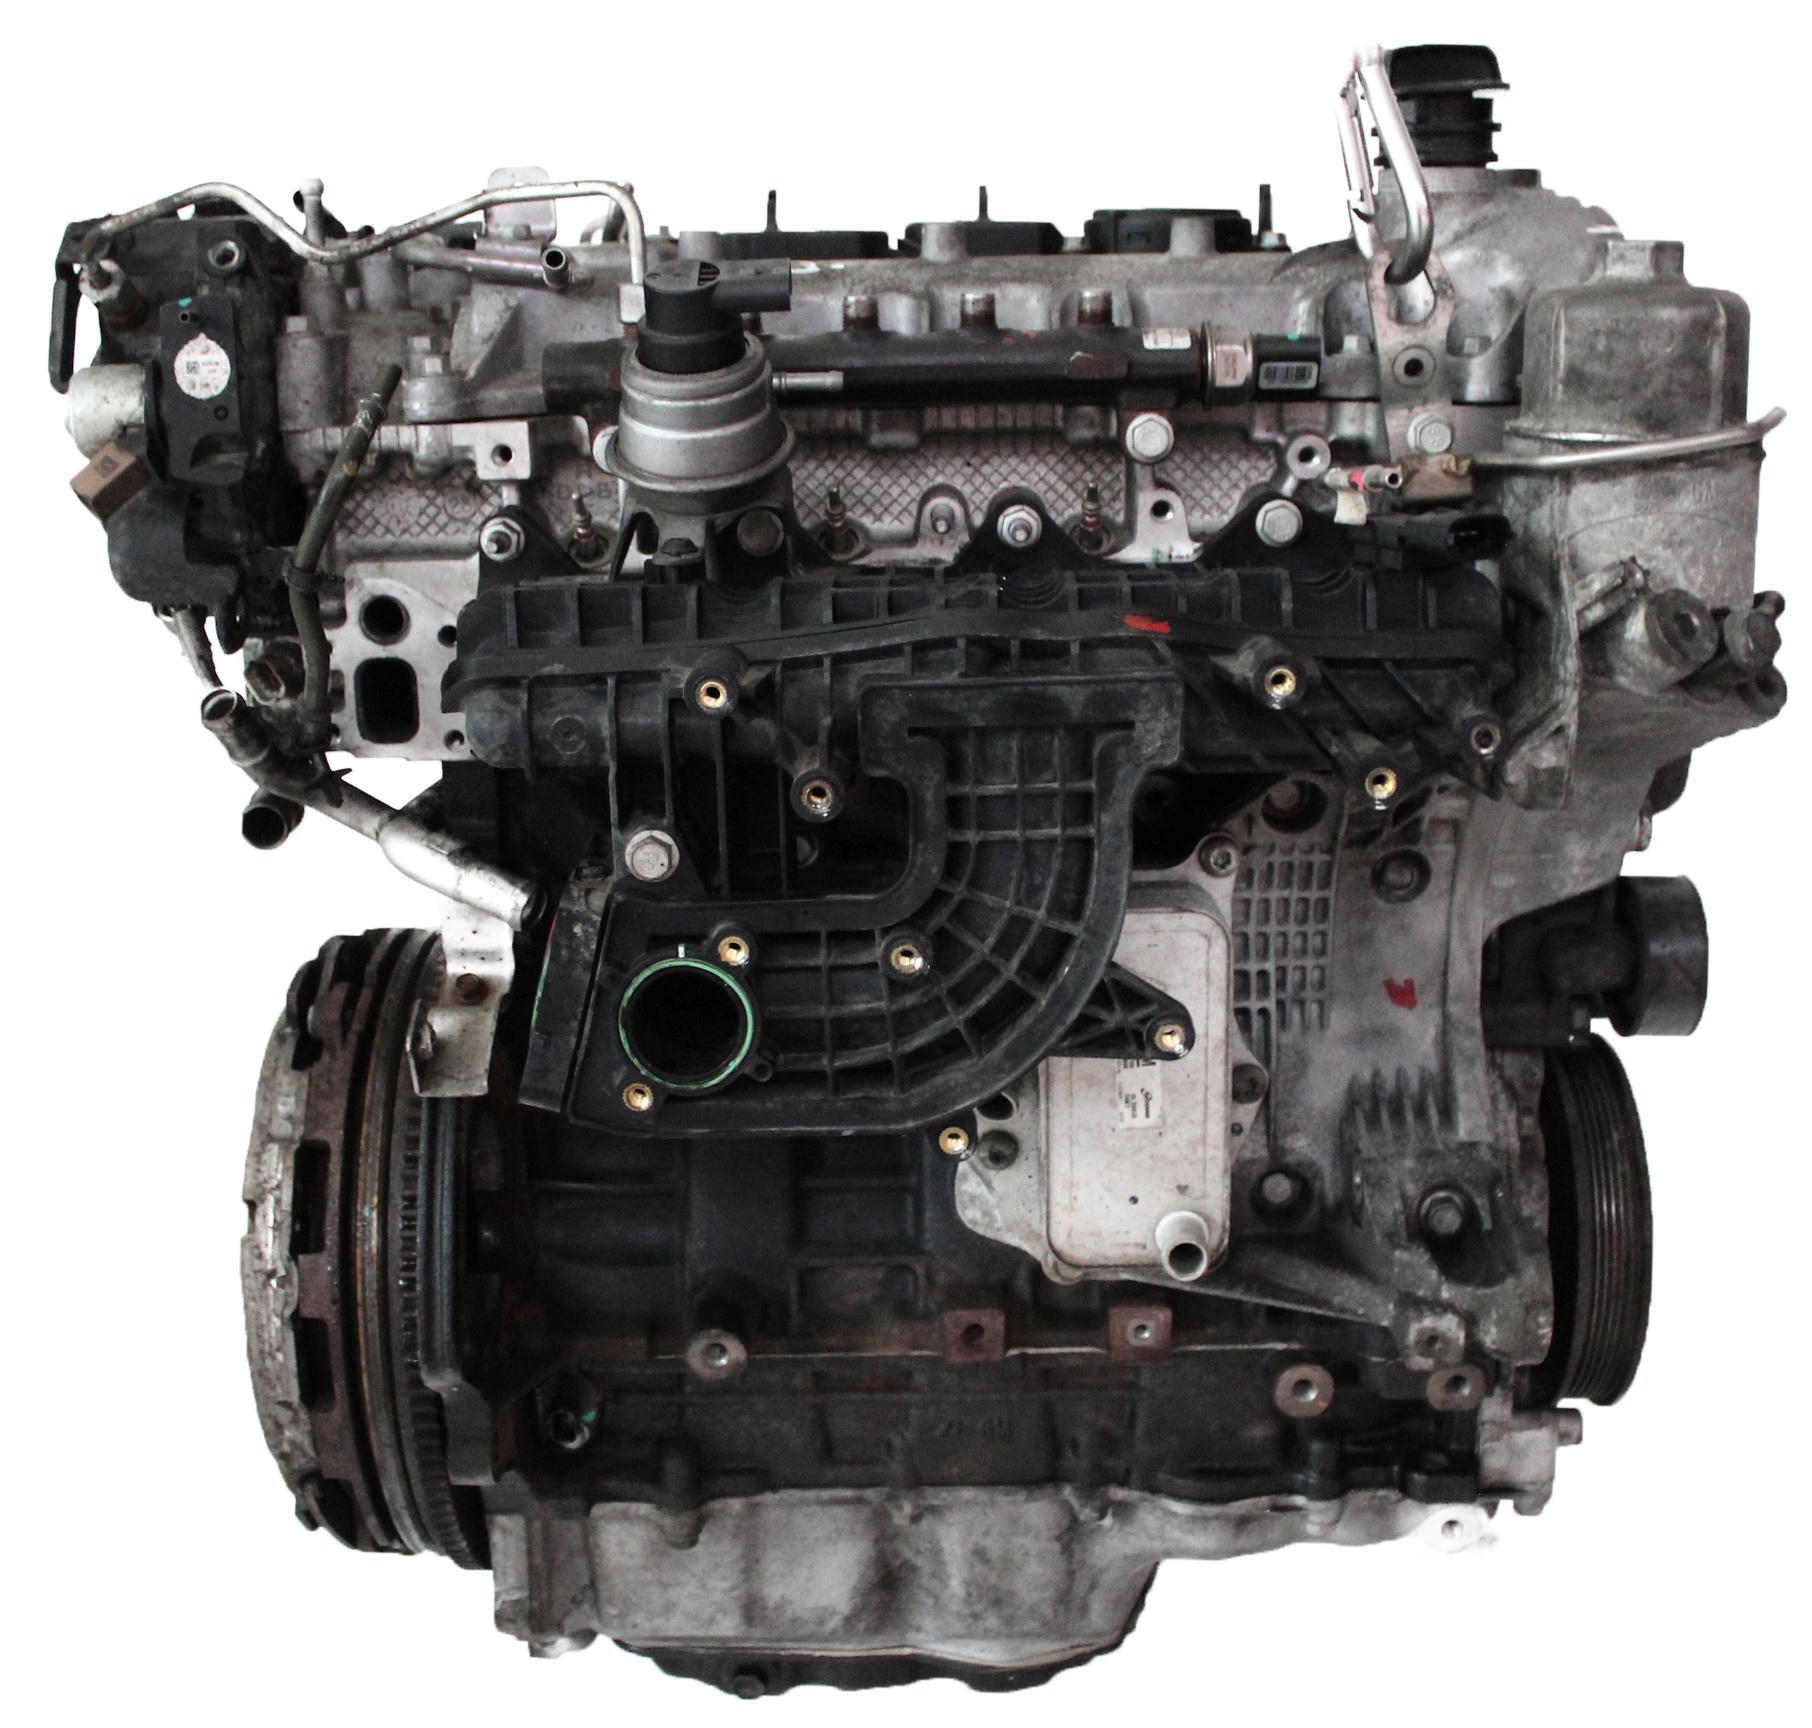 Motor 2012 Chevrolet Captiva 2,2 D Diesel Z22D1 Z22 mit Anbauteilen